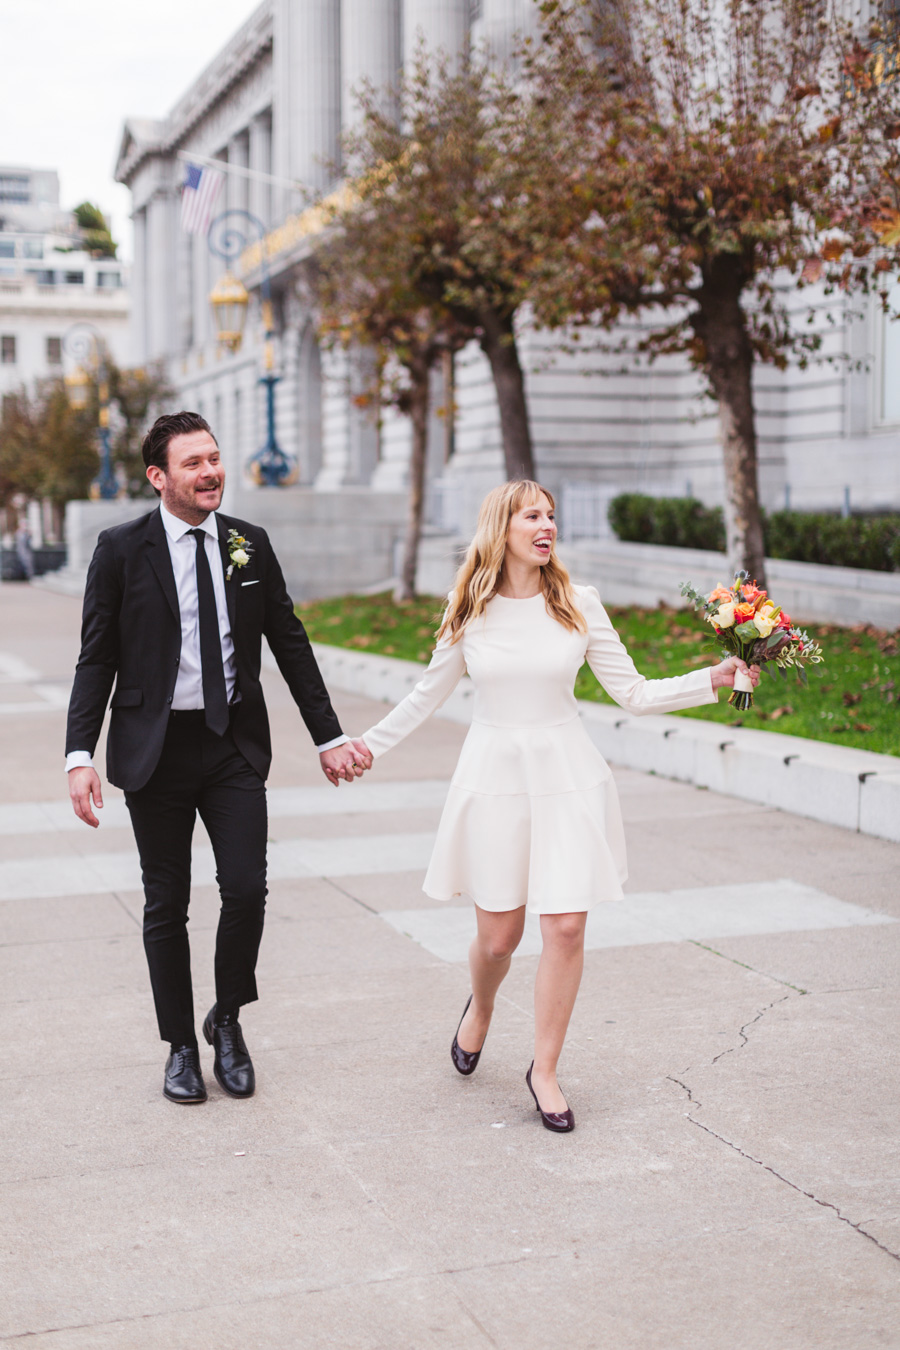 joyful stylish city hall wedding photography